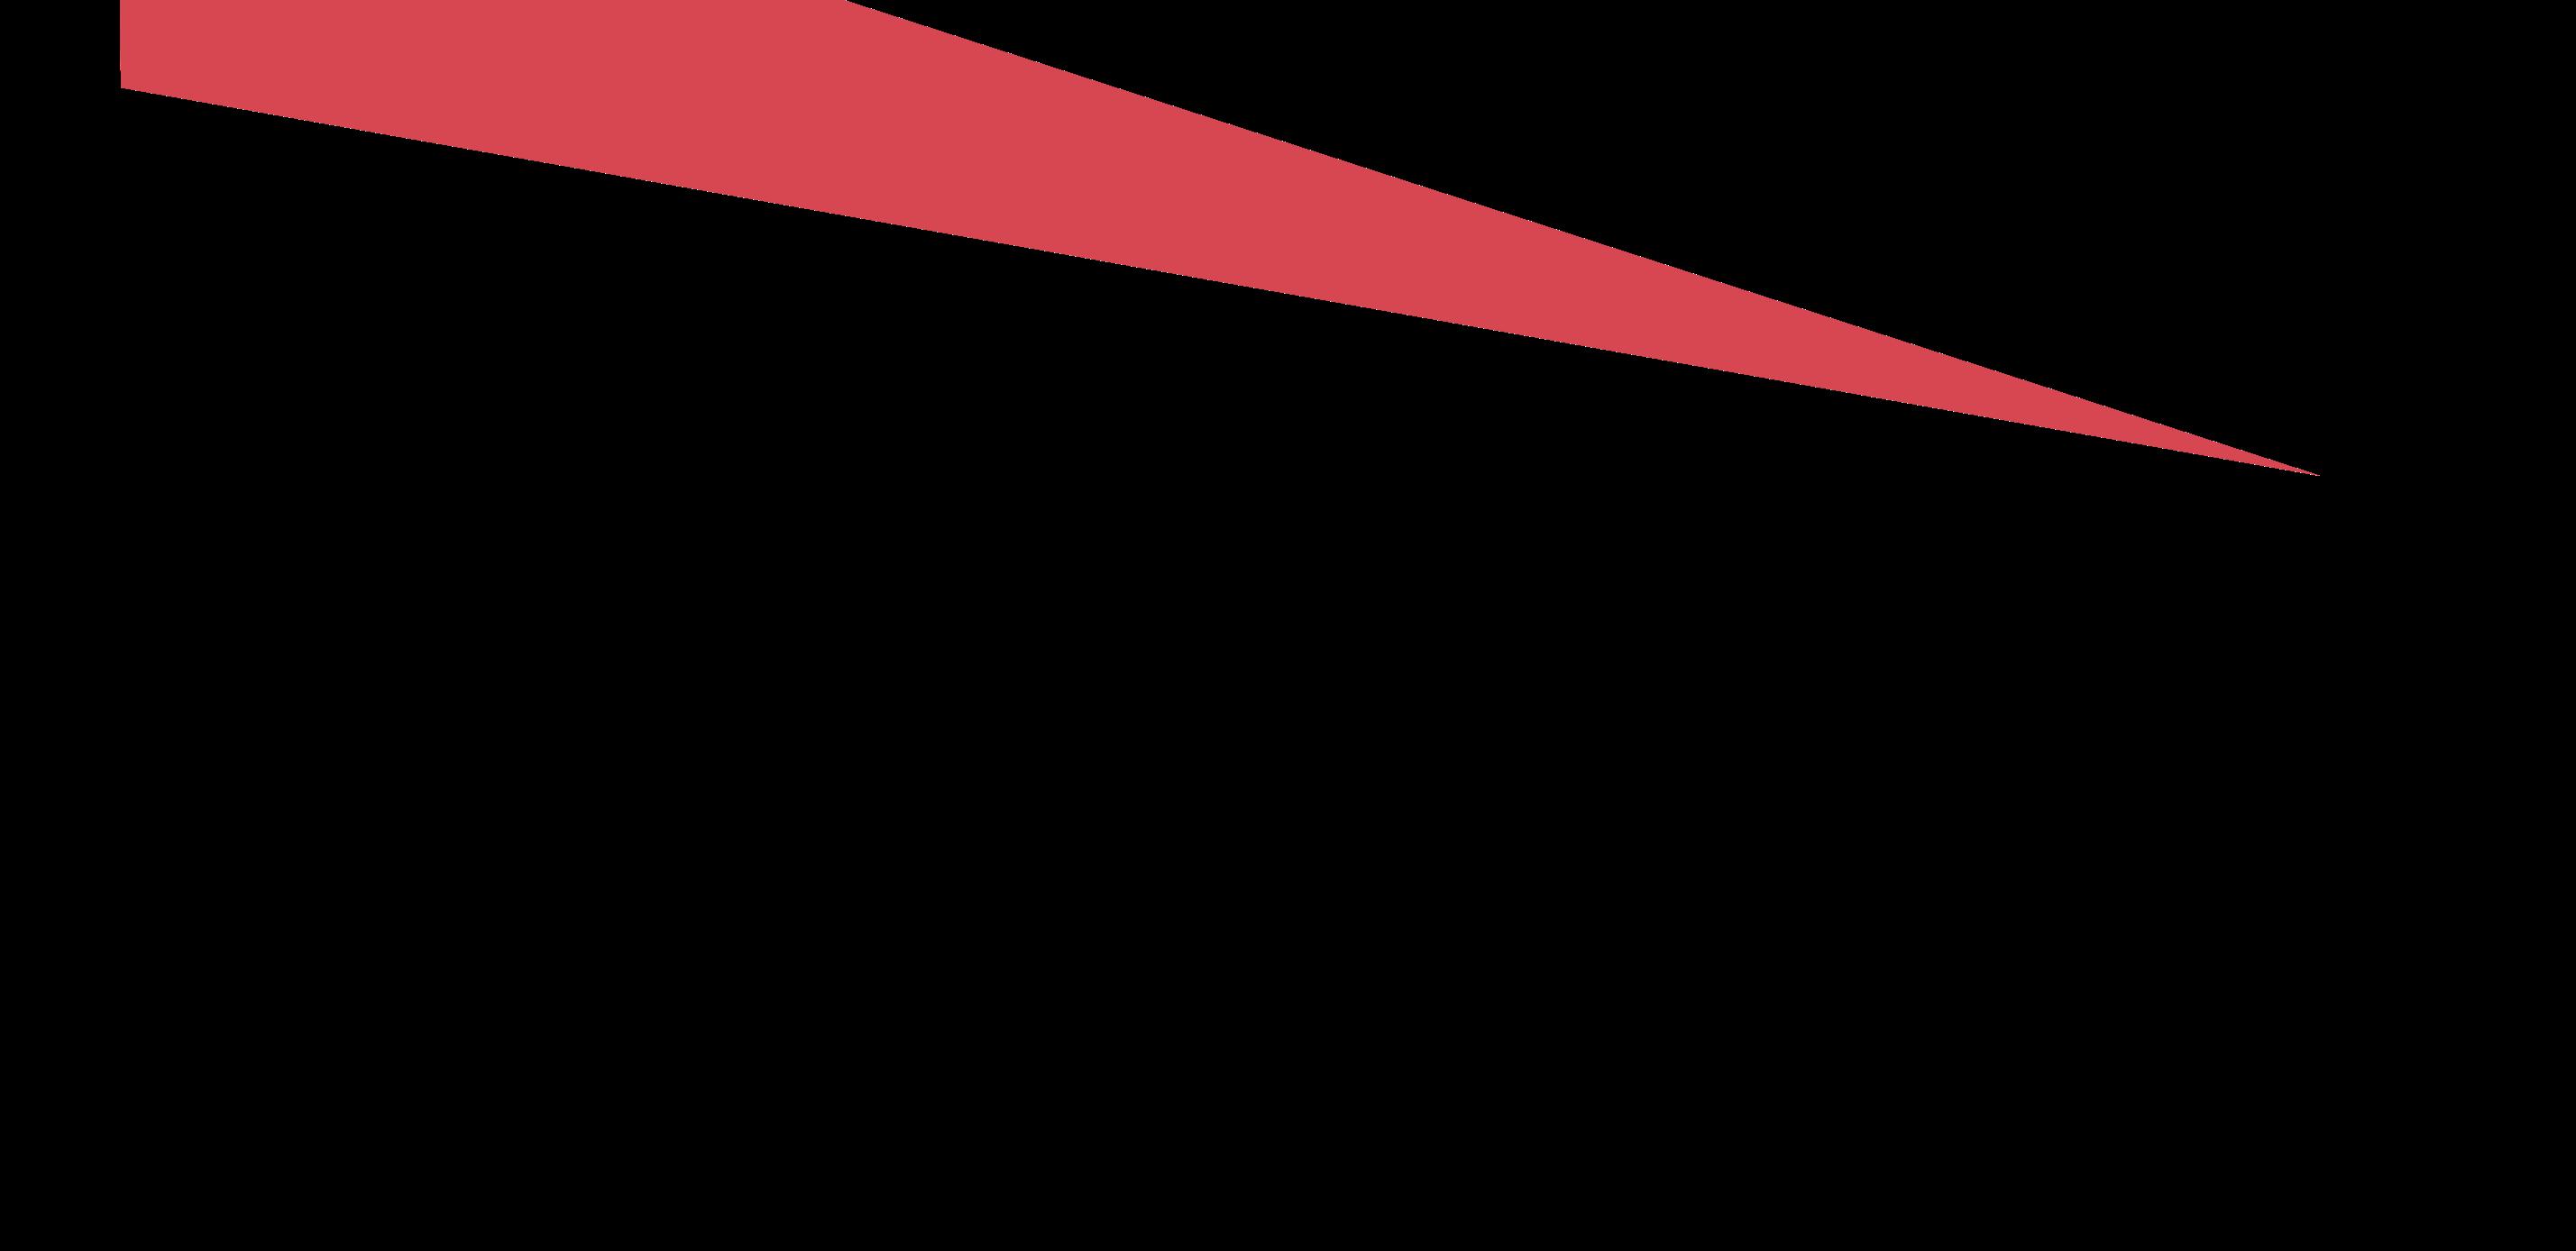 Background Vector